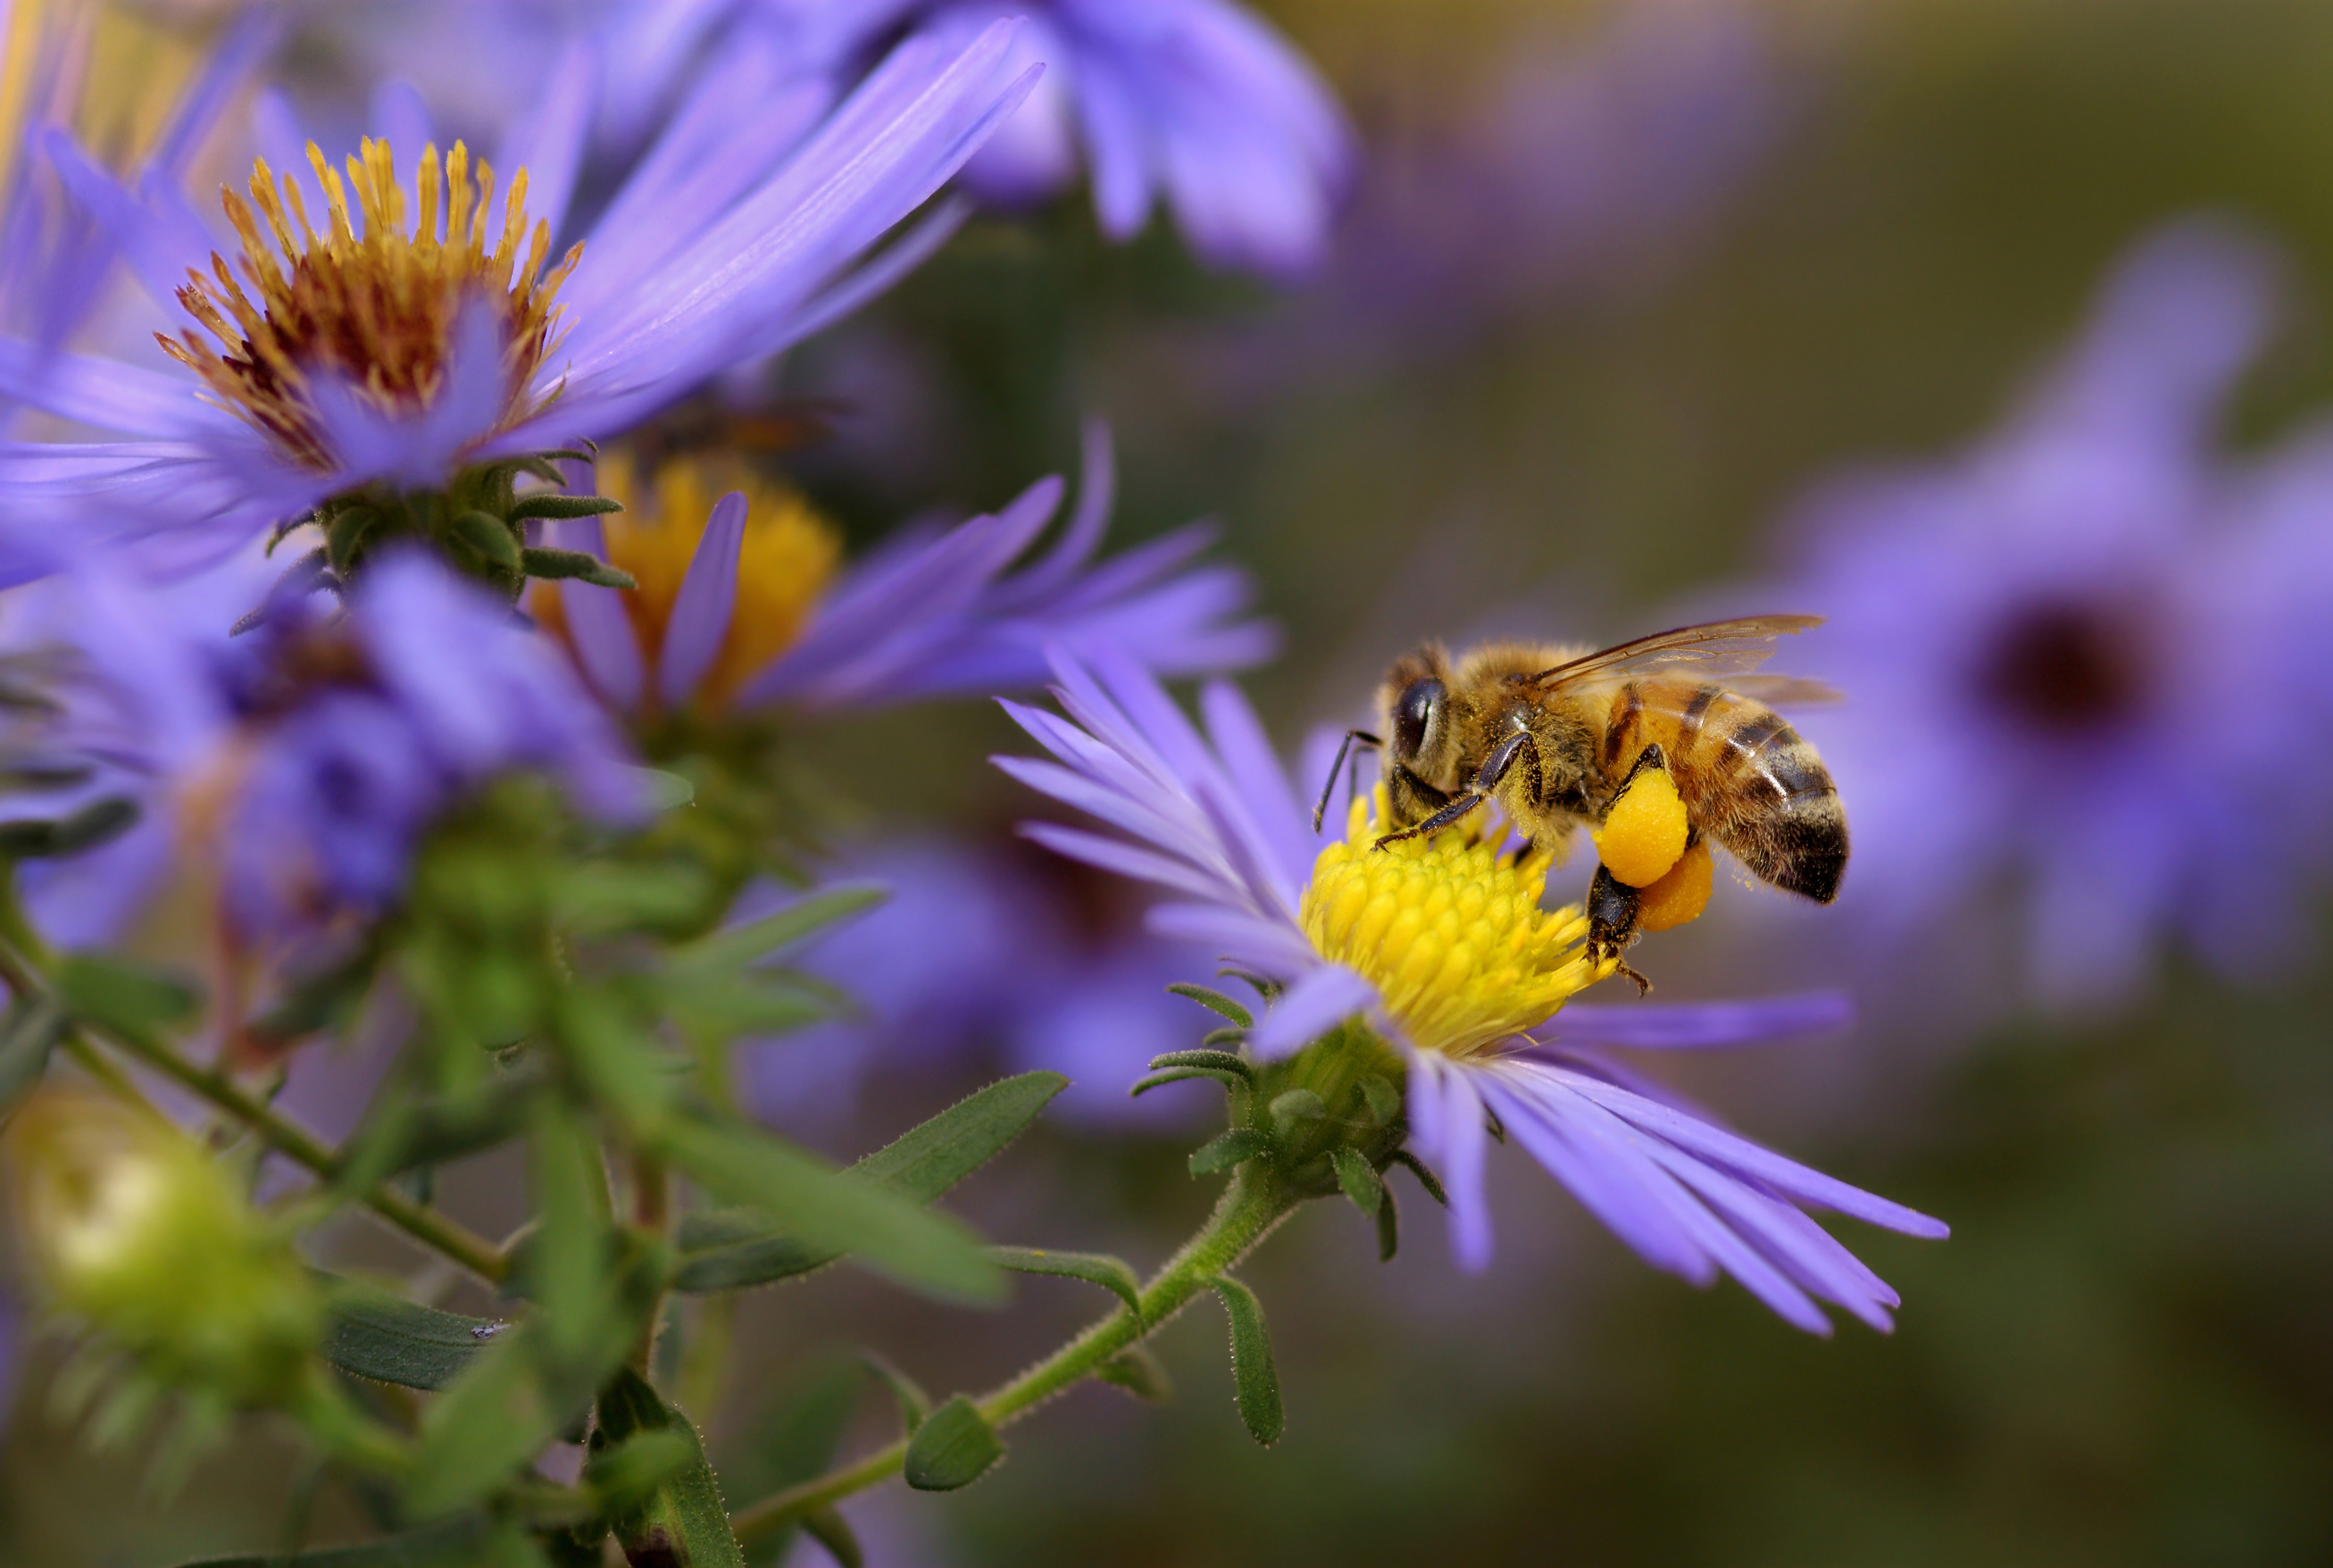 Teen Craft Kits to Go: Bee Gardens